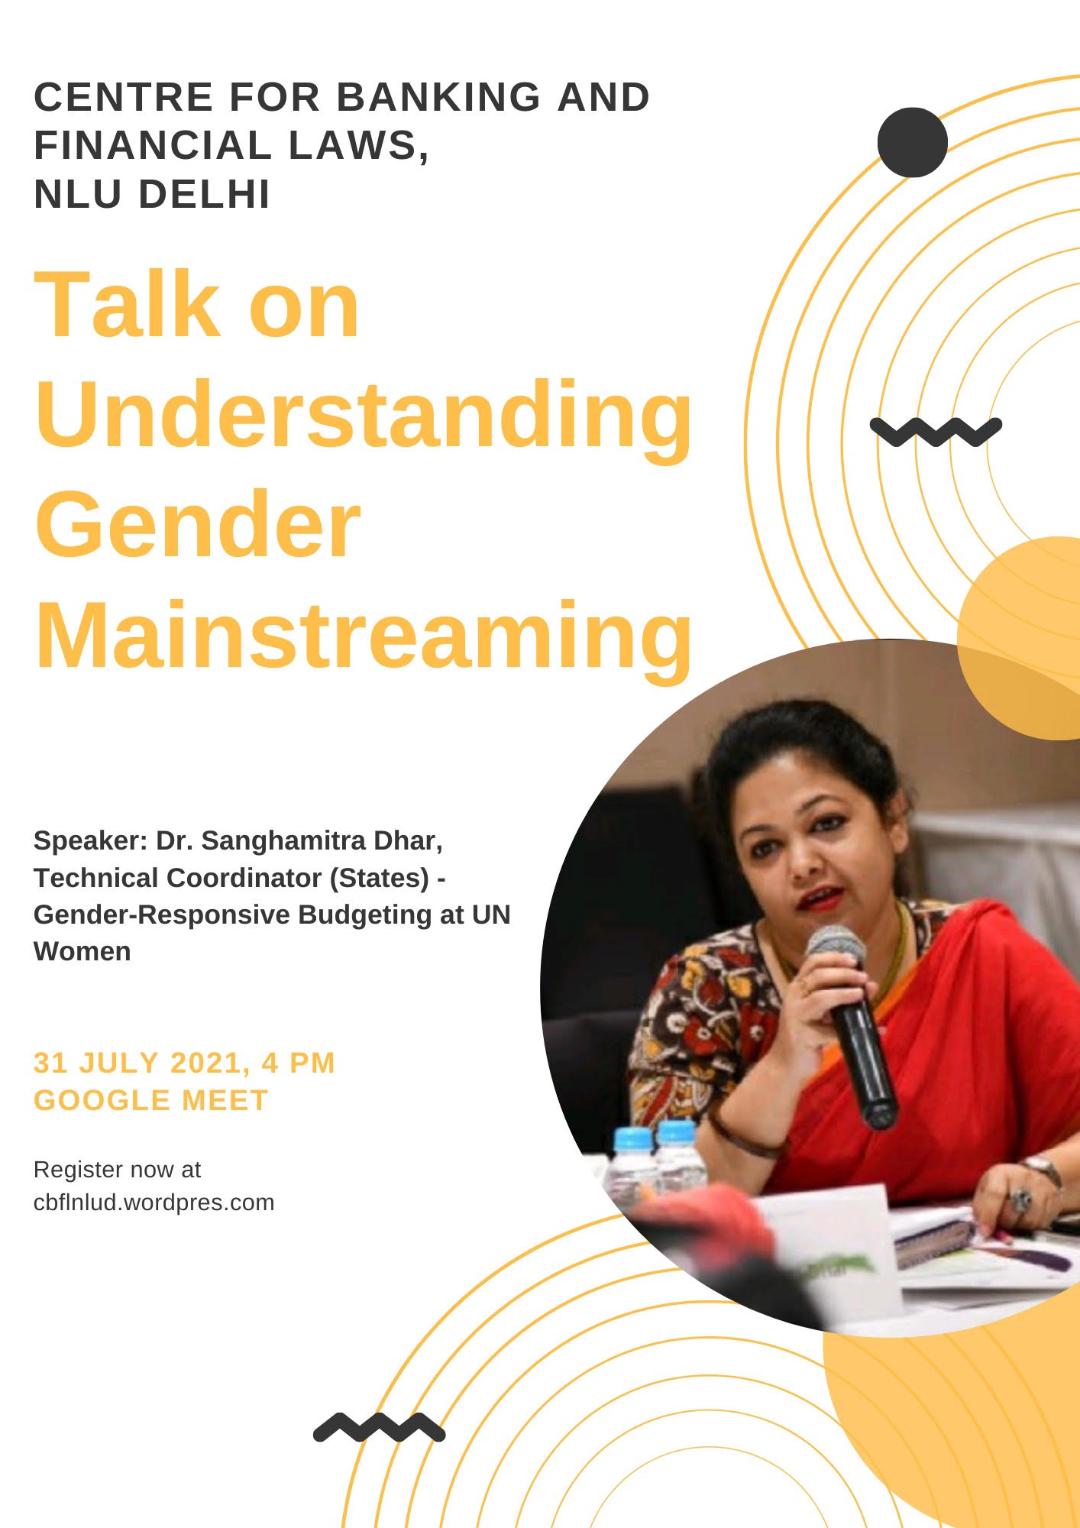 NLU DELHI: Talk On Understanding Gender Mainstreaming By Dr Sanghamitra Dhar [July 31,2021]